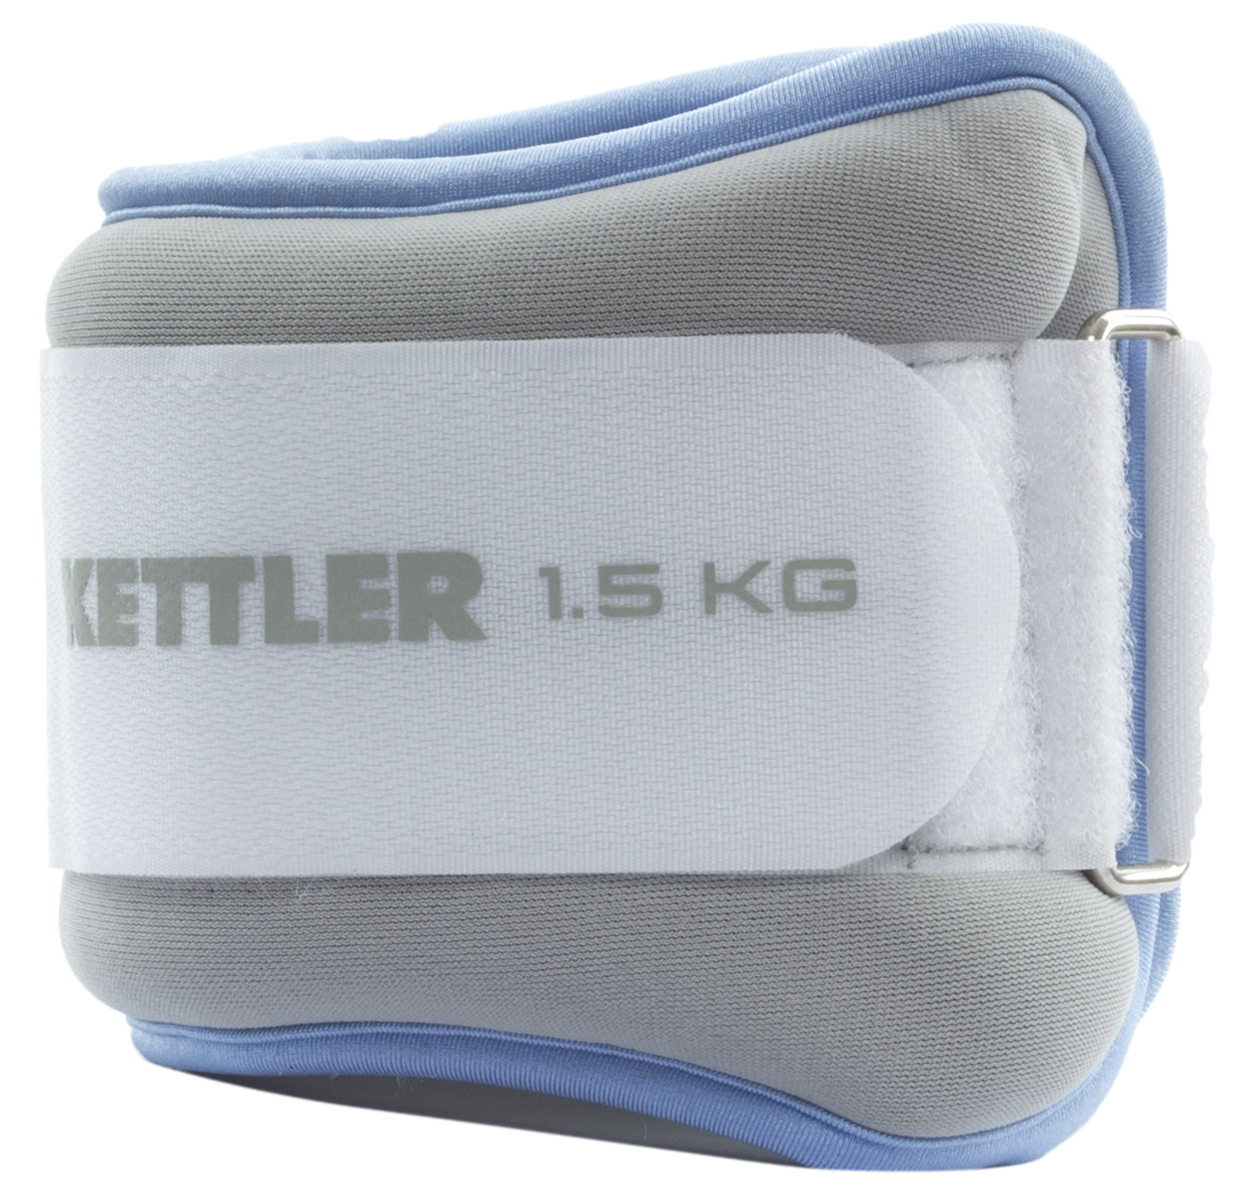 Kettler Утяжелитель для ног Kettler, 2 х 1,5 кг